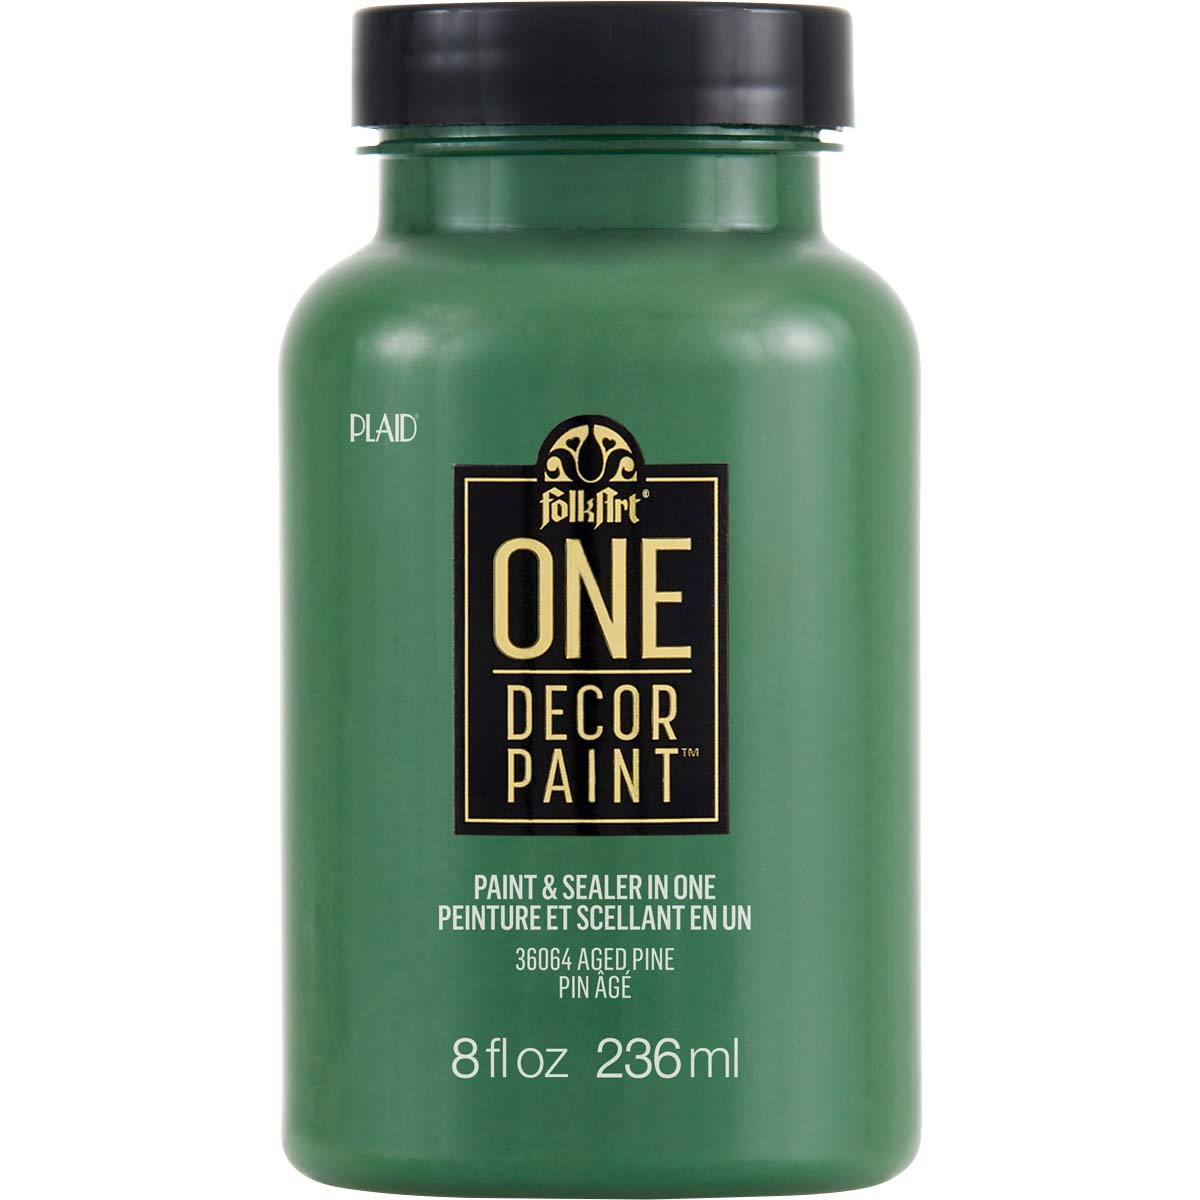 FolkArt ® One Décor Paint™ - Aged Pine, 8 oz. - 36064